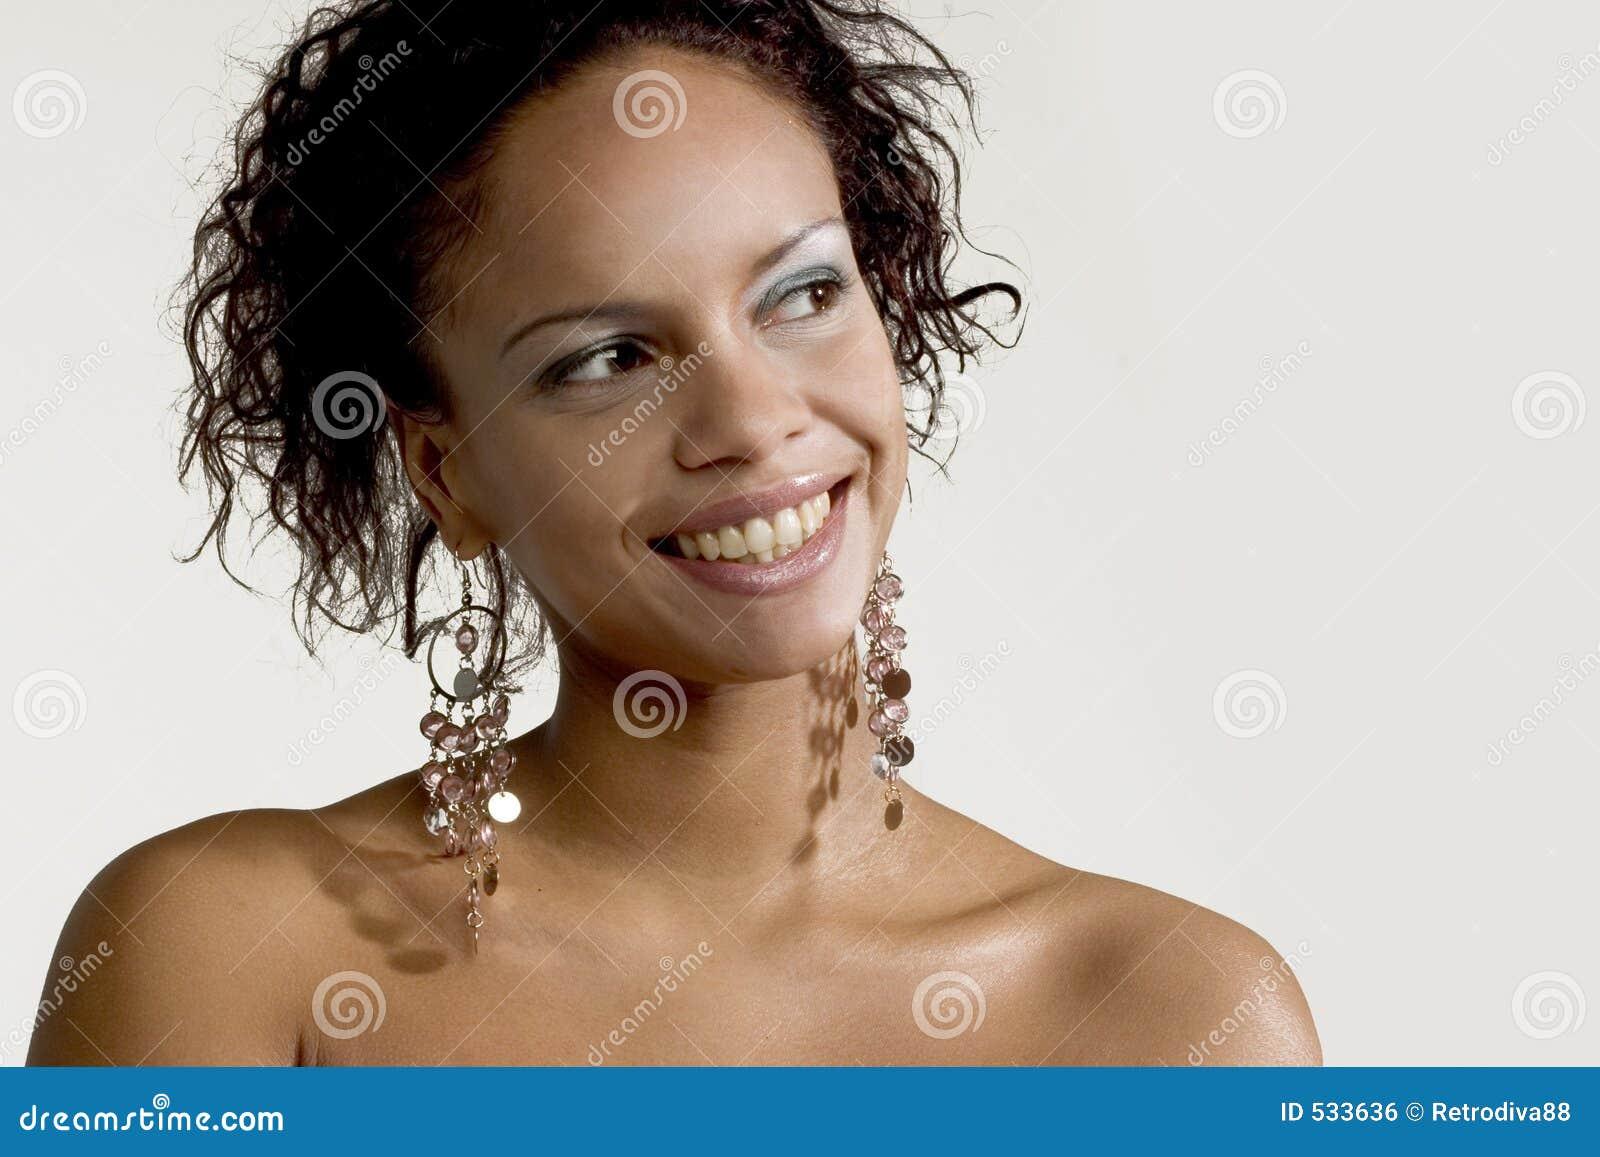 Download 表面俏丽微笑 库存照片. 图片 包括有 和平, haircare, 脸色, 眼睛, 方式, 头发, 破擦声, 女孩 - 533636